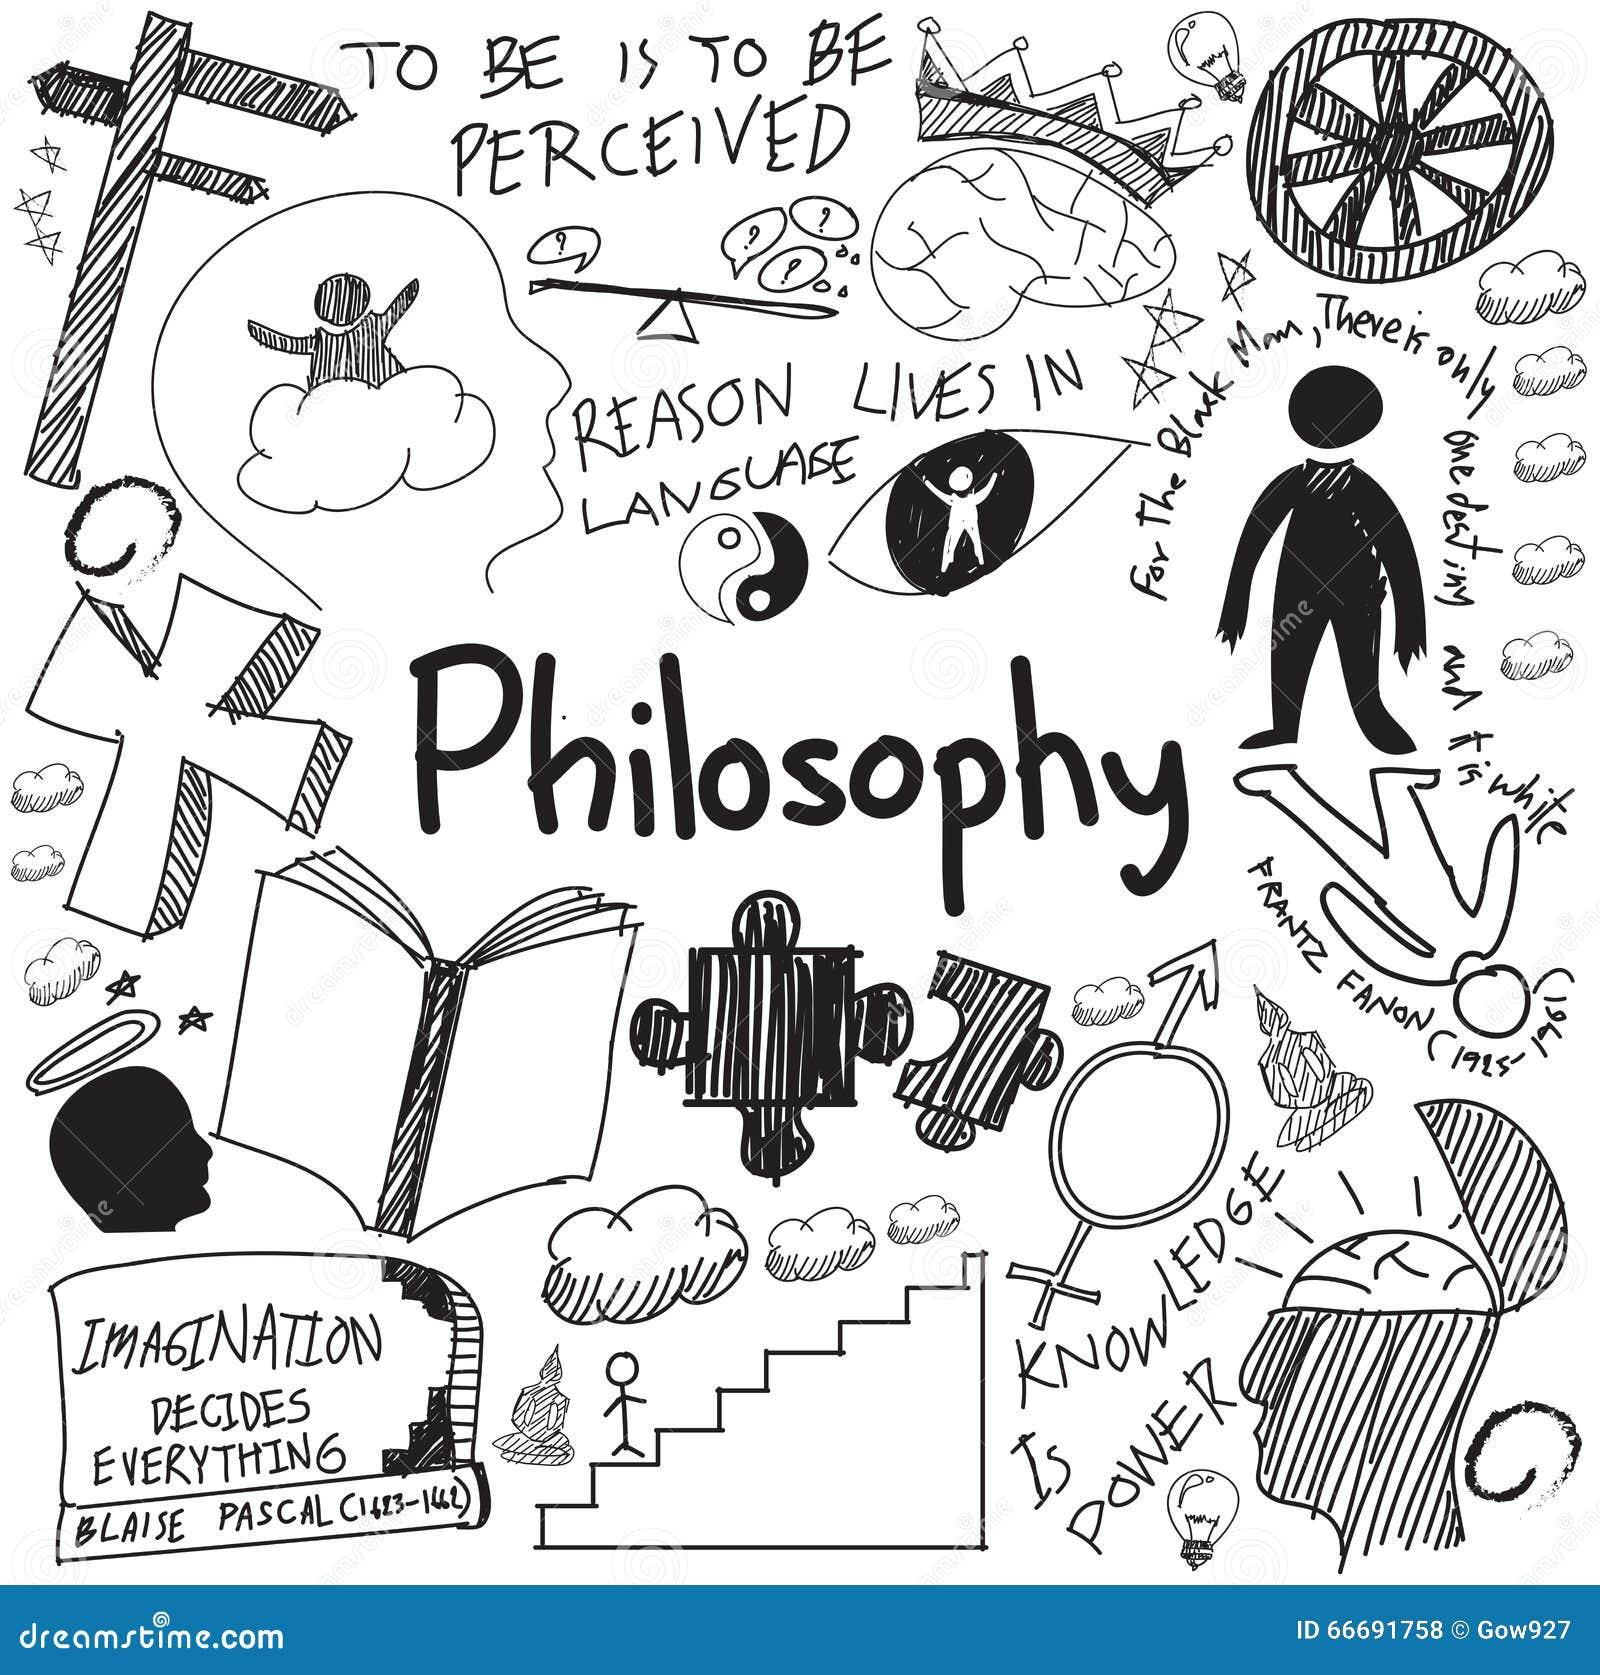 Franz kafka biography essay